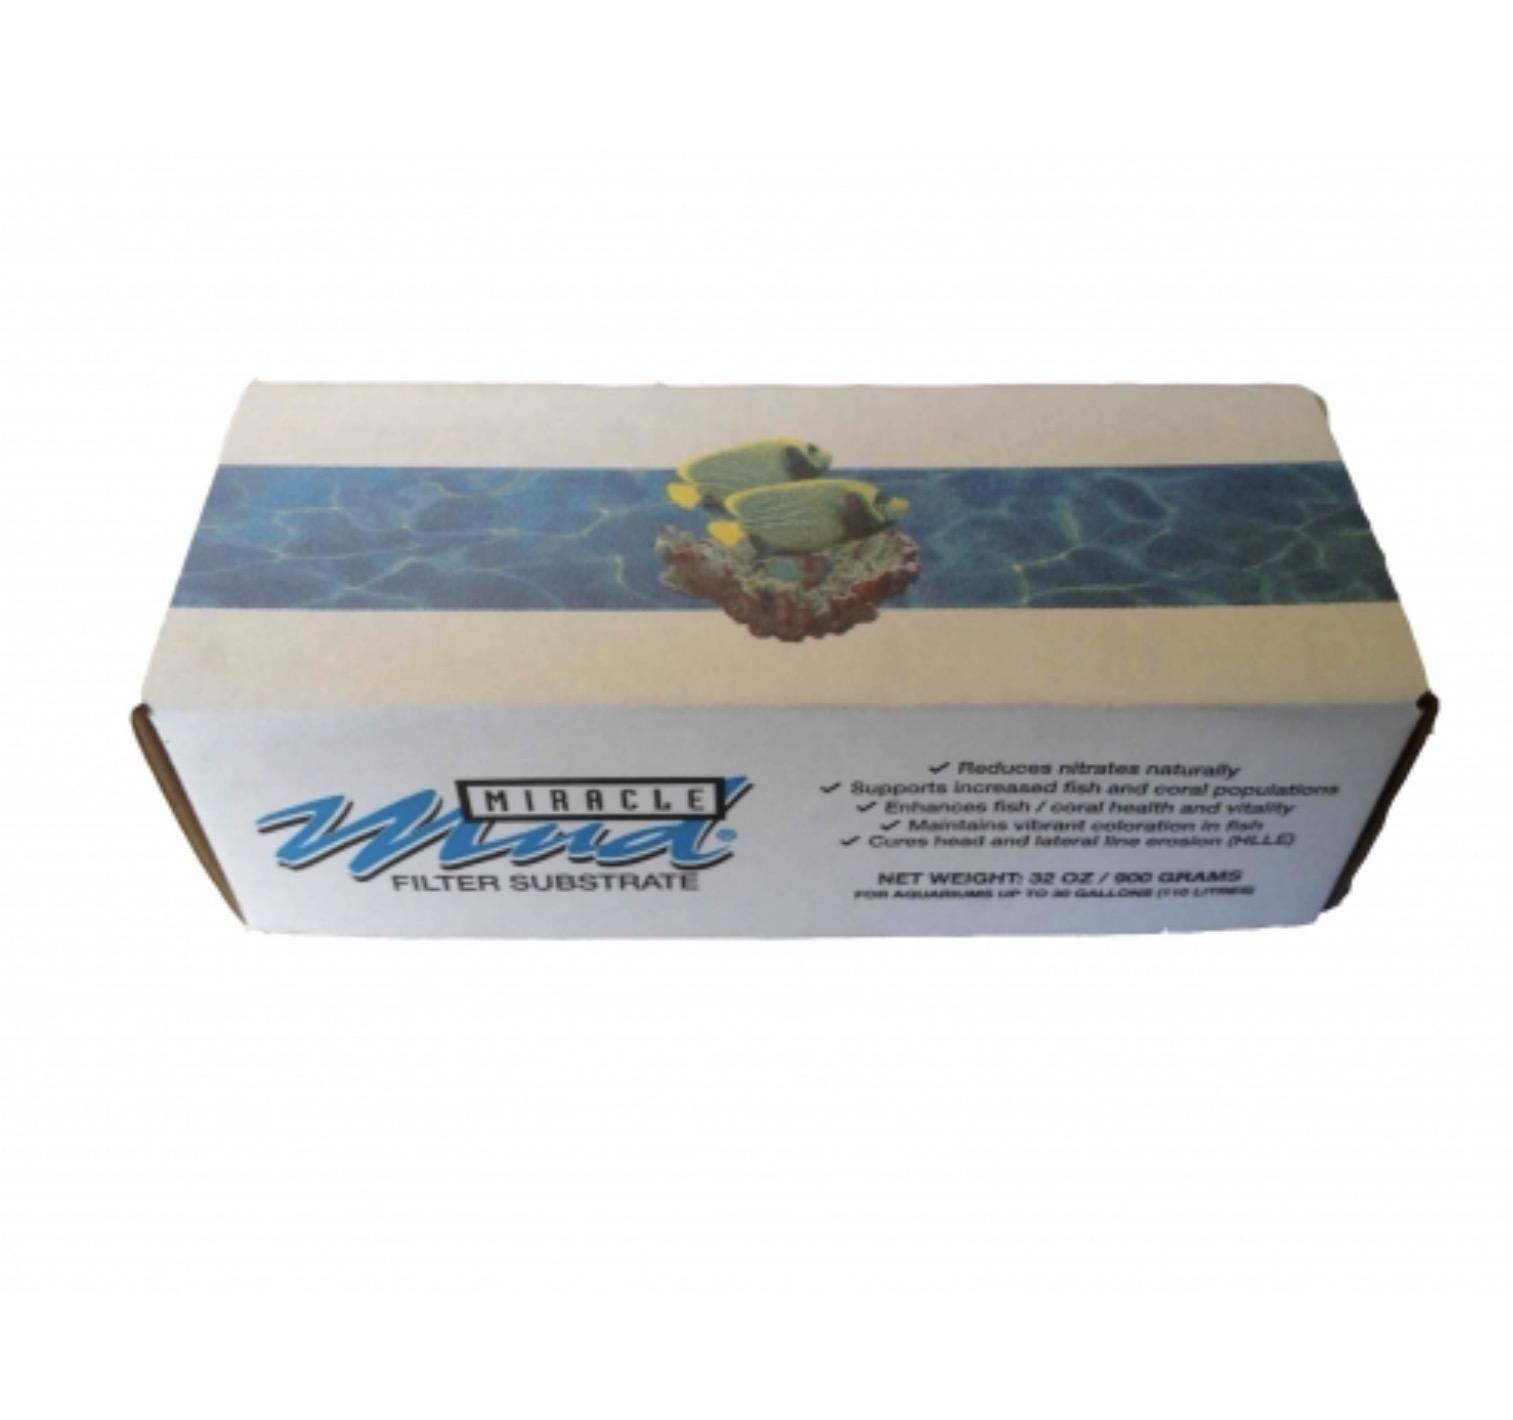 Ecosystem Aquarium Miracle Mud Tray - 0,9 kg